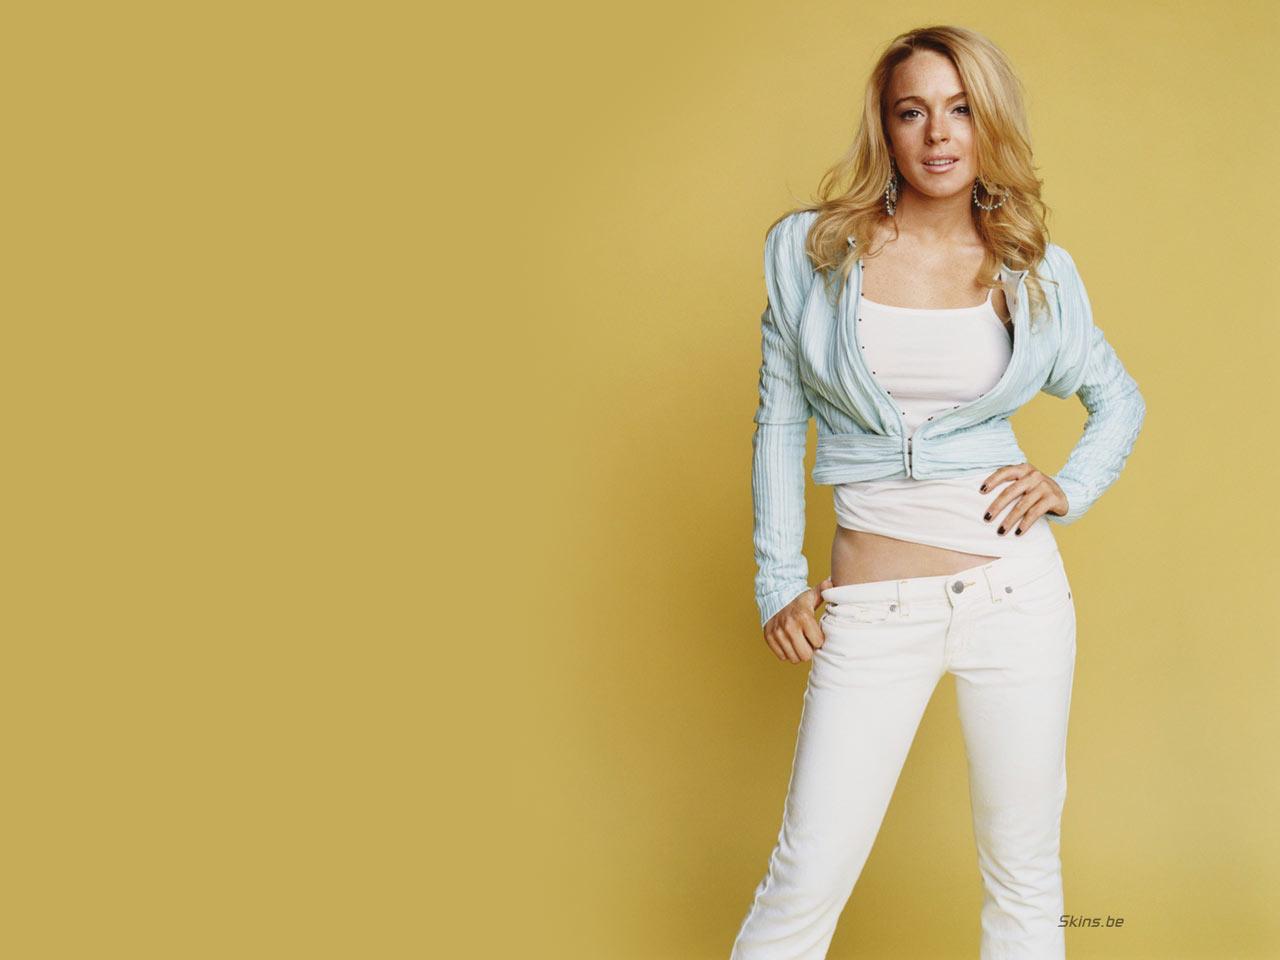 Lindsay Lohan wallpaper (#19768)